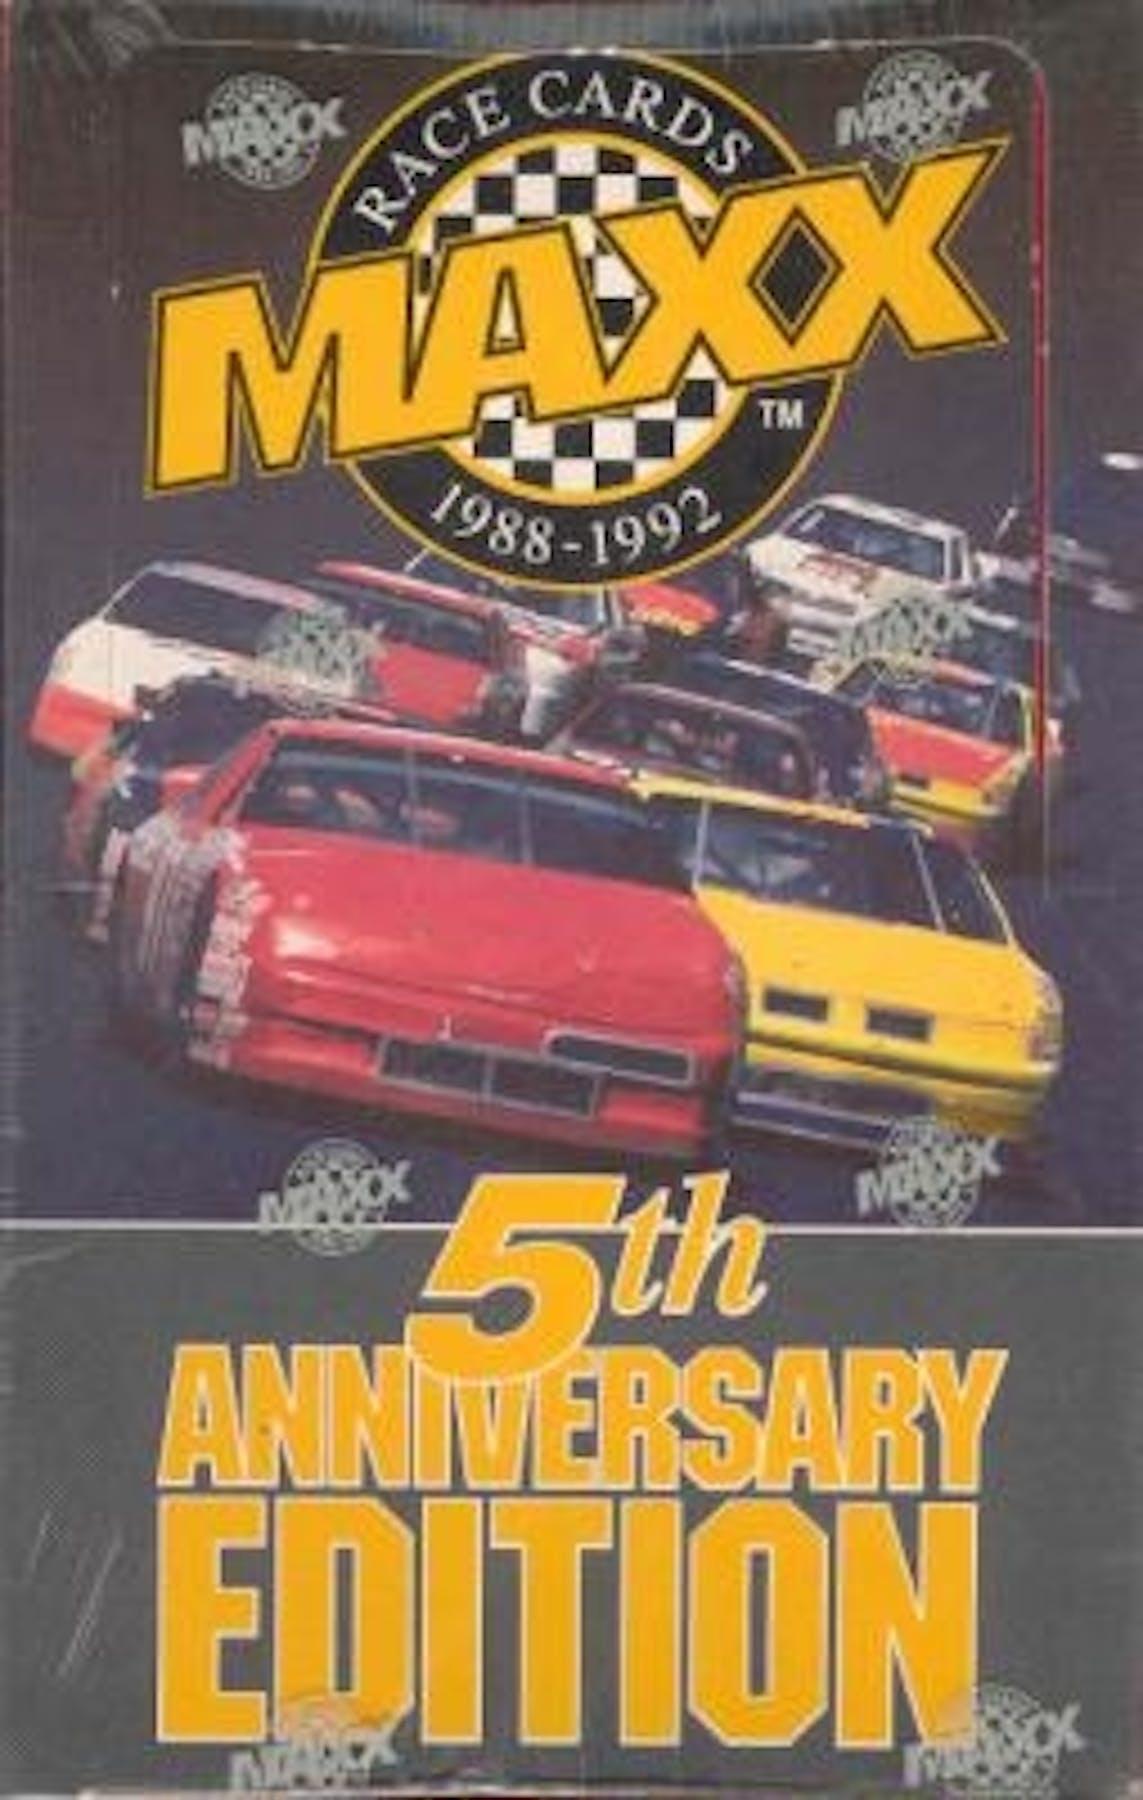 1992 J.R. Maxx Inc. Maxx 5th Anniversary Edition Racing Hobby Box ...